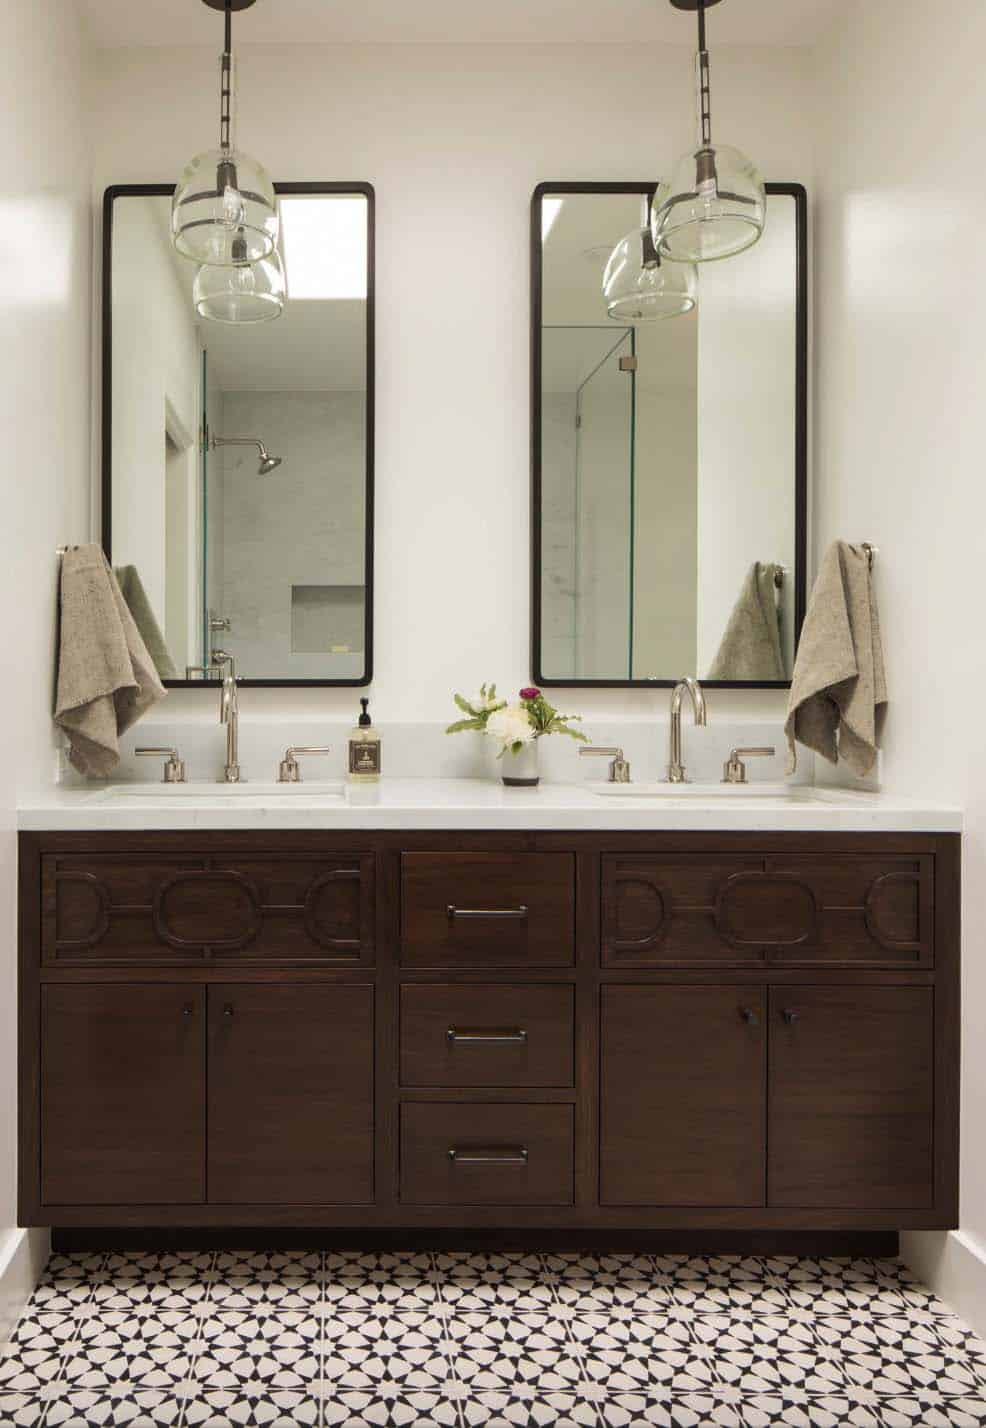 Mediterranean Style Home-Jute Interior Design-11-1 Kindesign